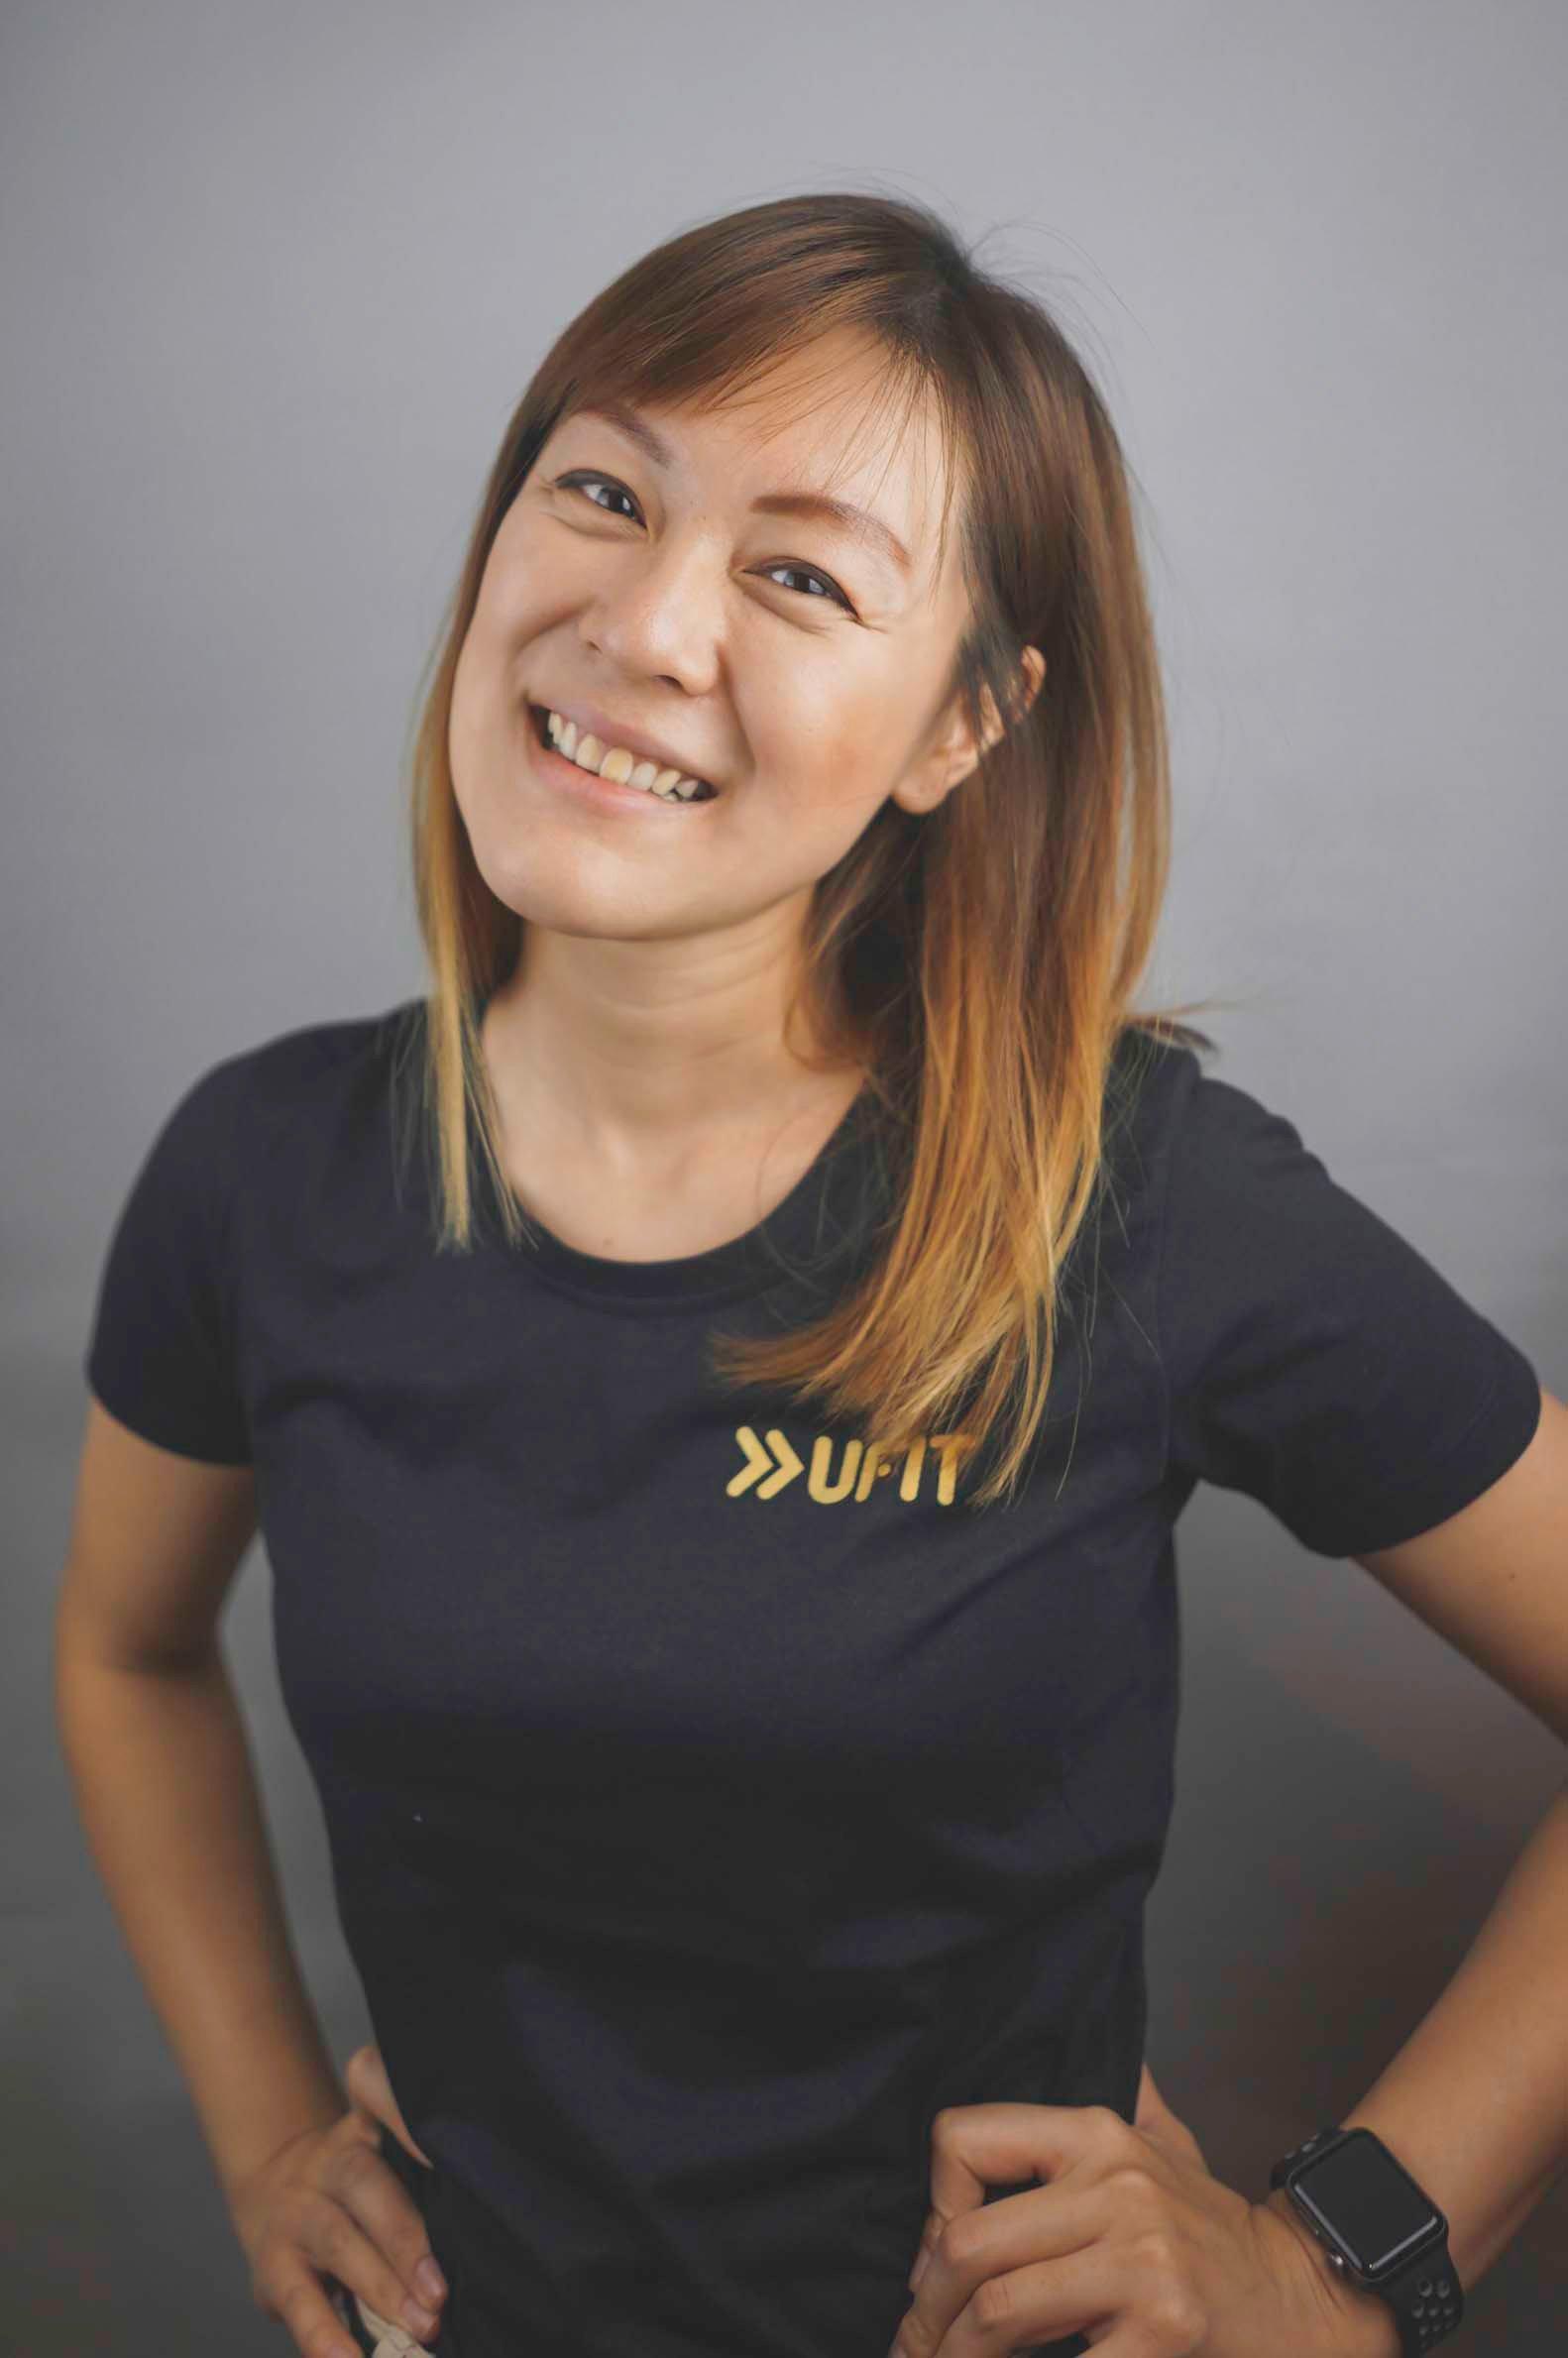 UFIT Fiona Nutritionist 02